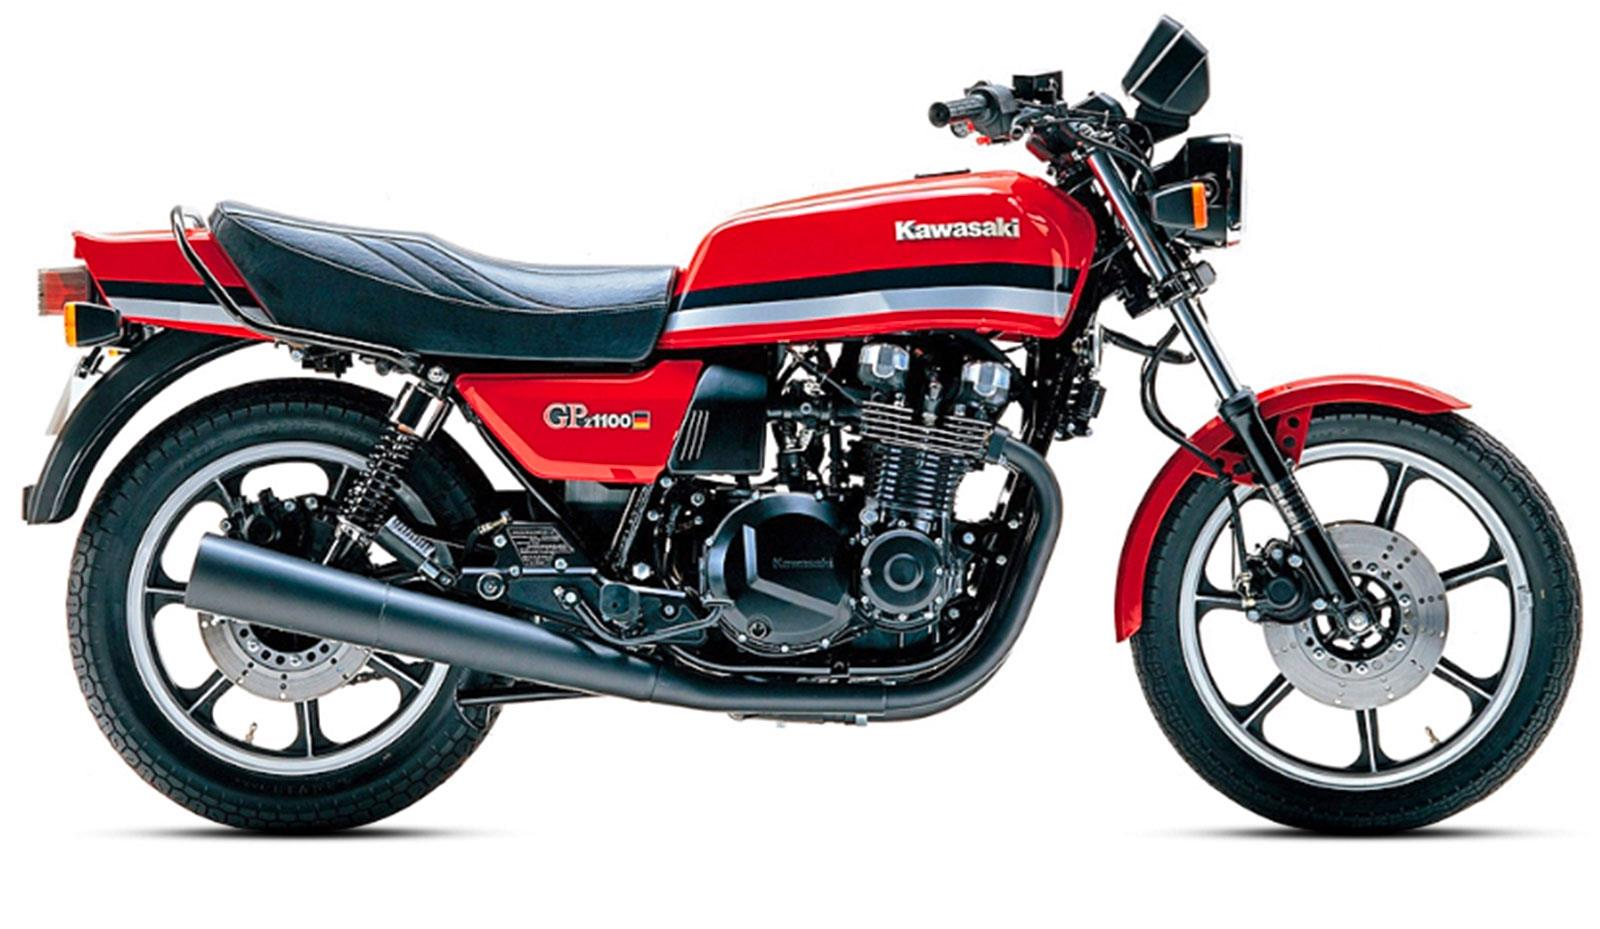 Kawasaki GPz1100: The last king of a vanished clan ...